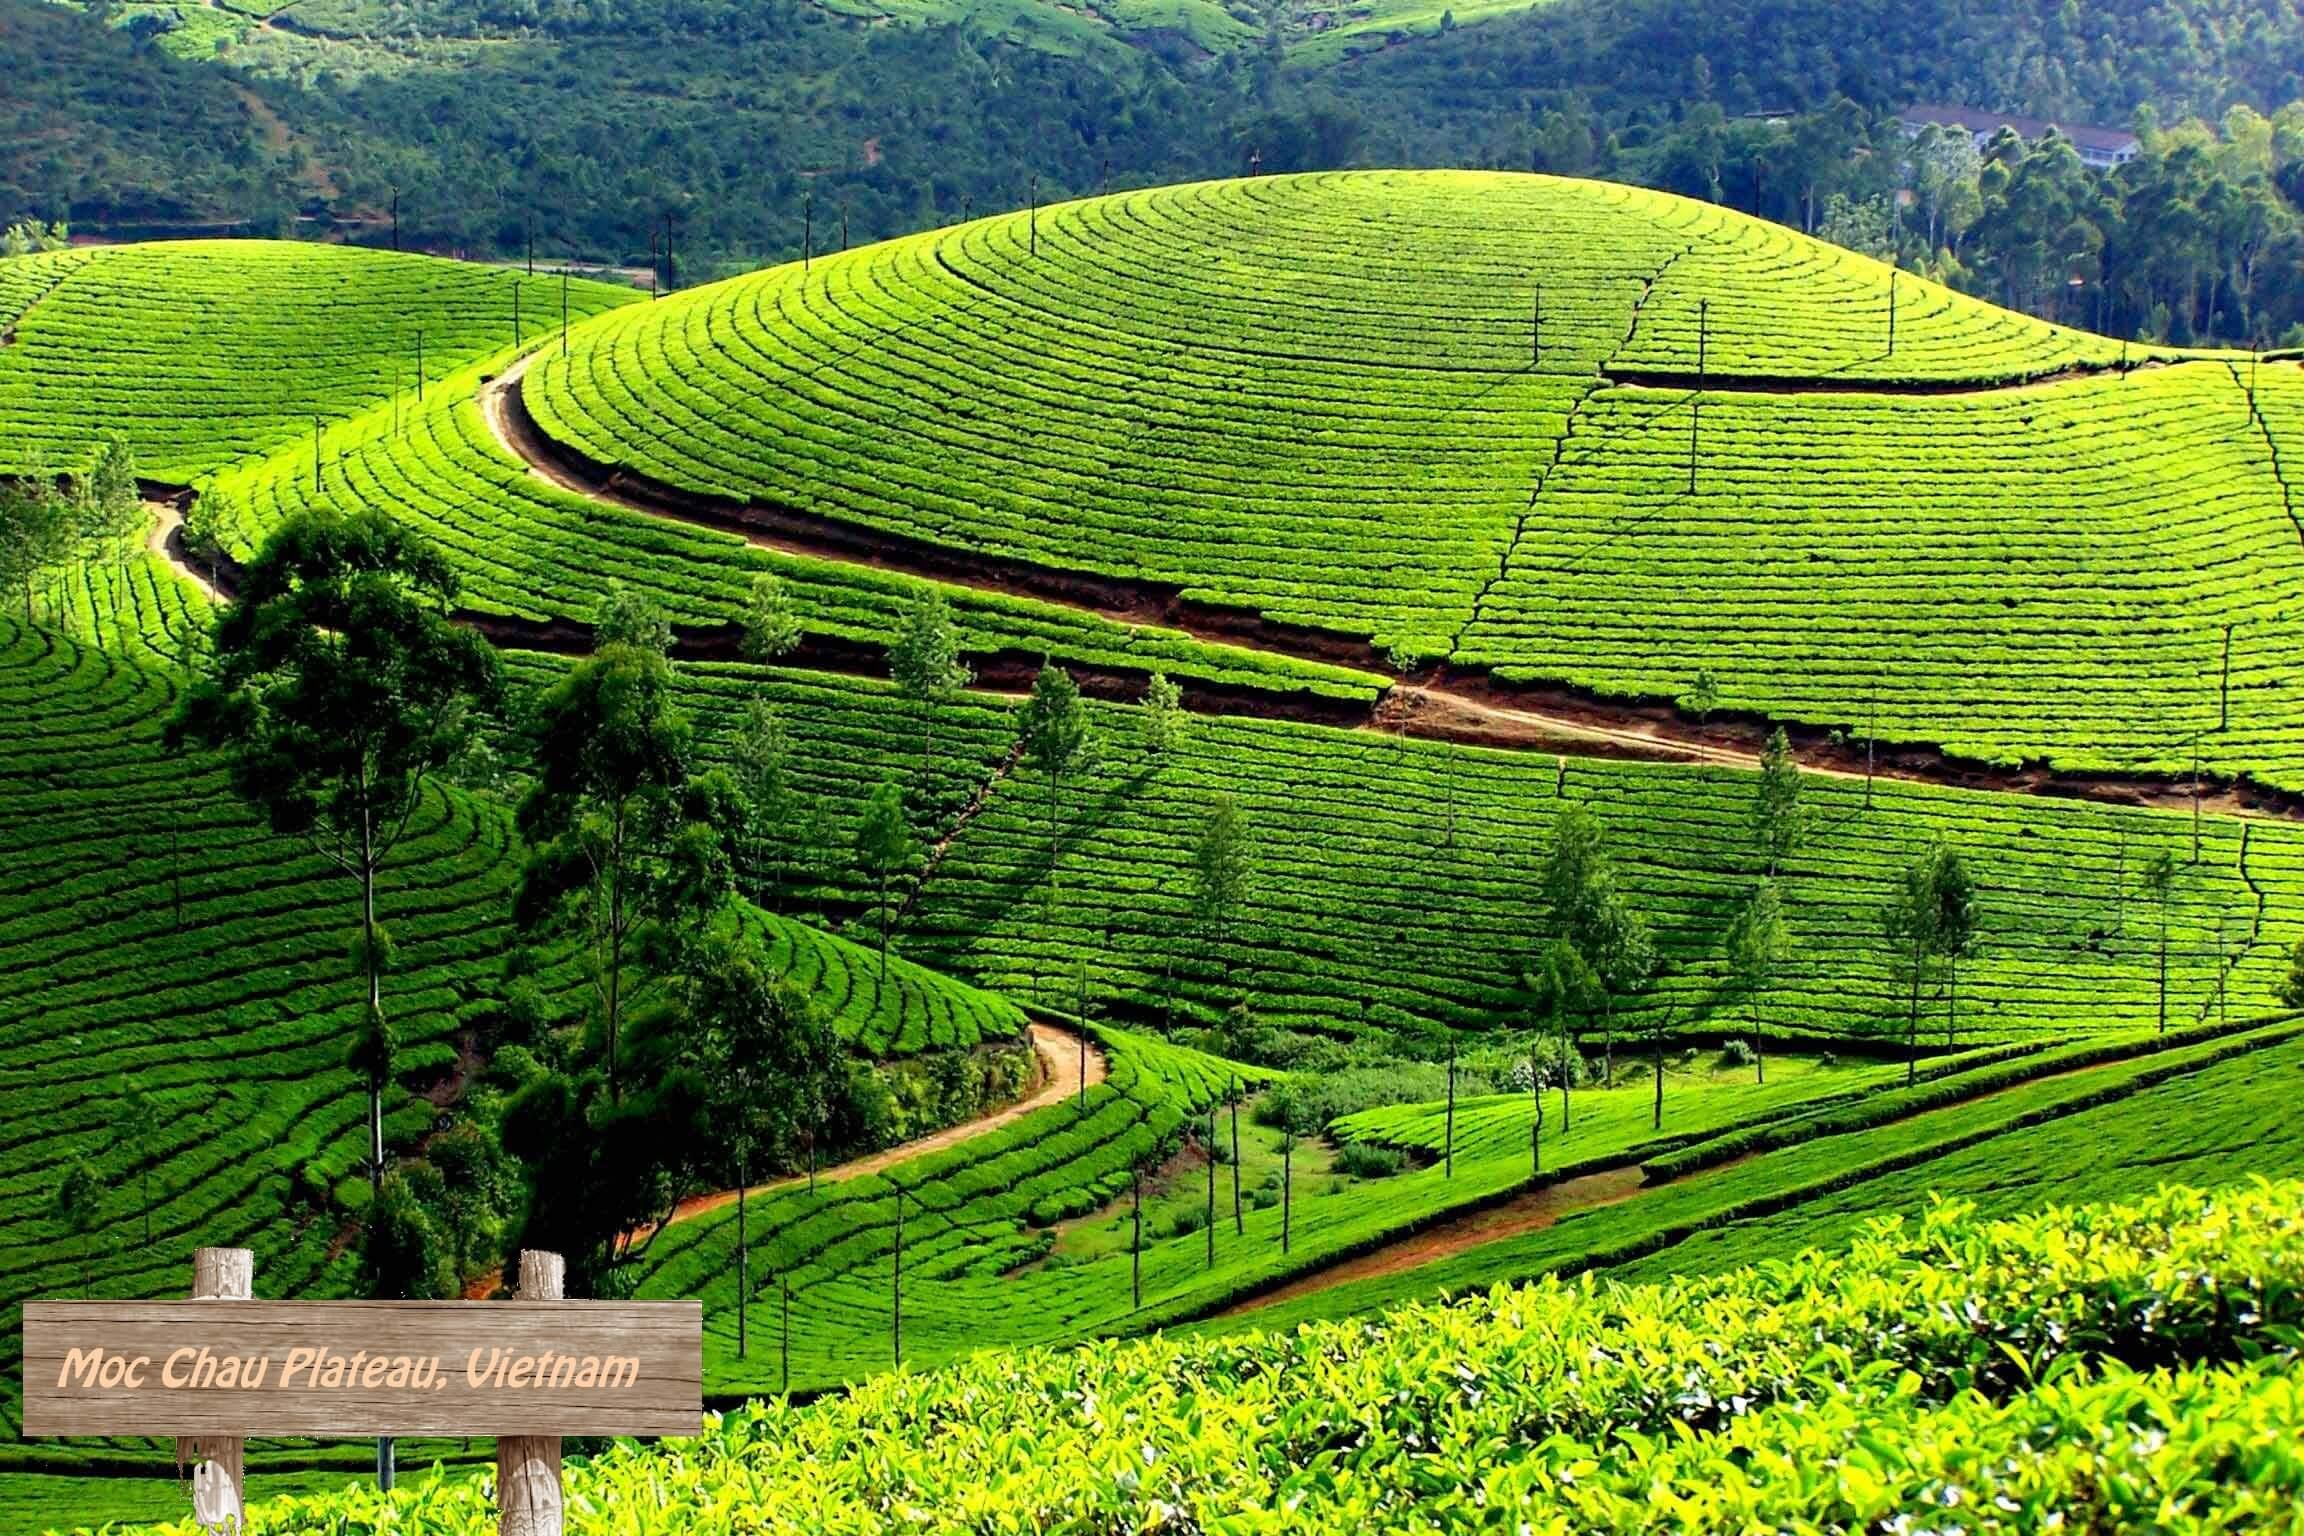 Moc Chau Plateau, Vietnam